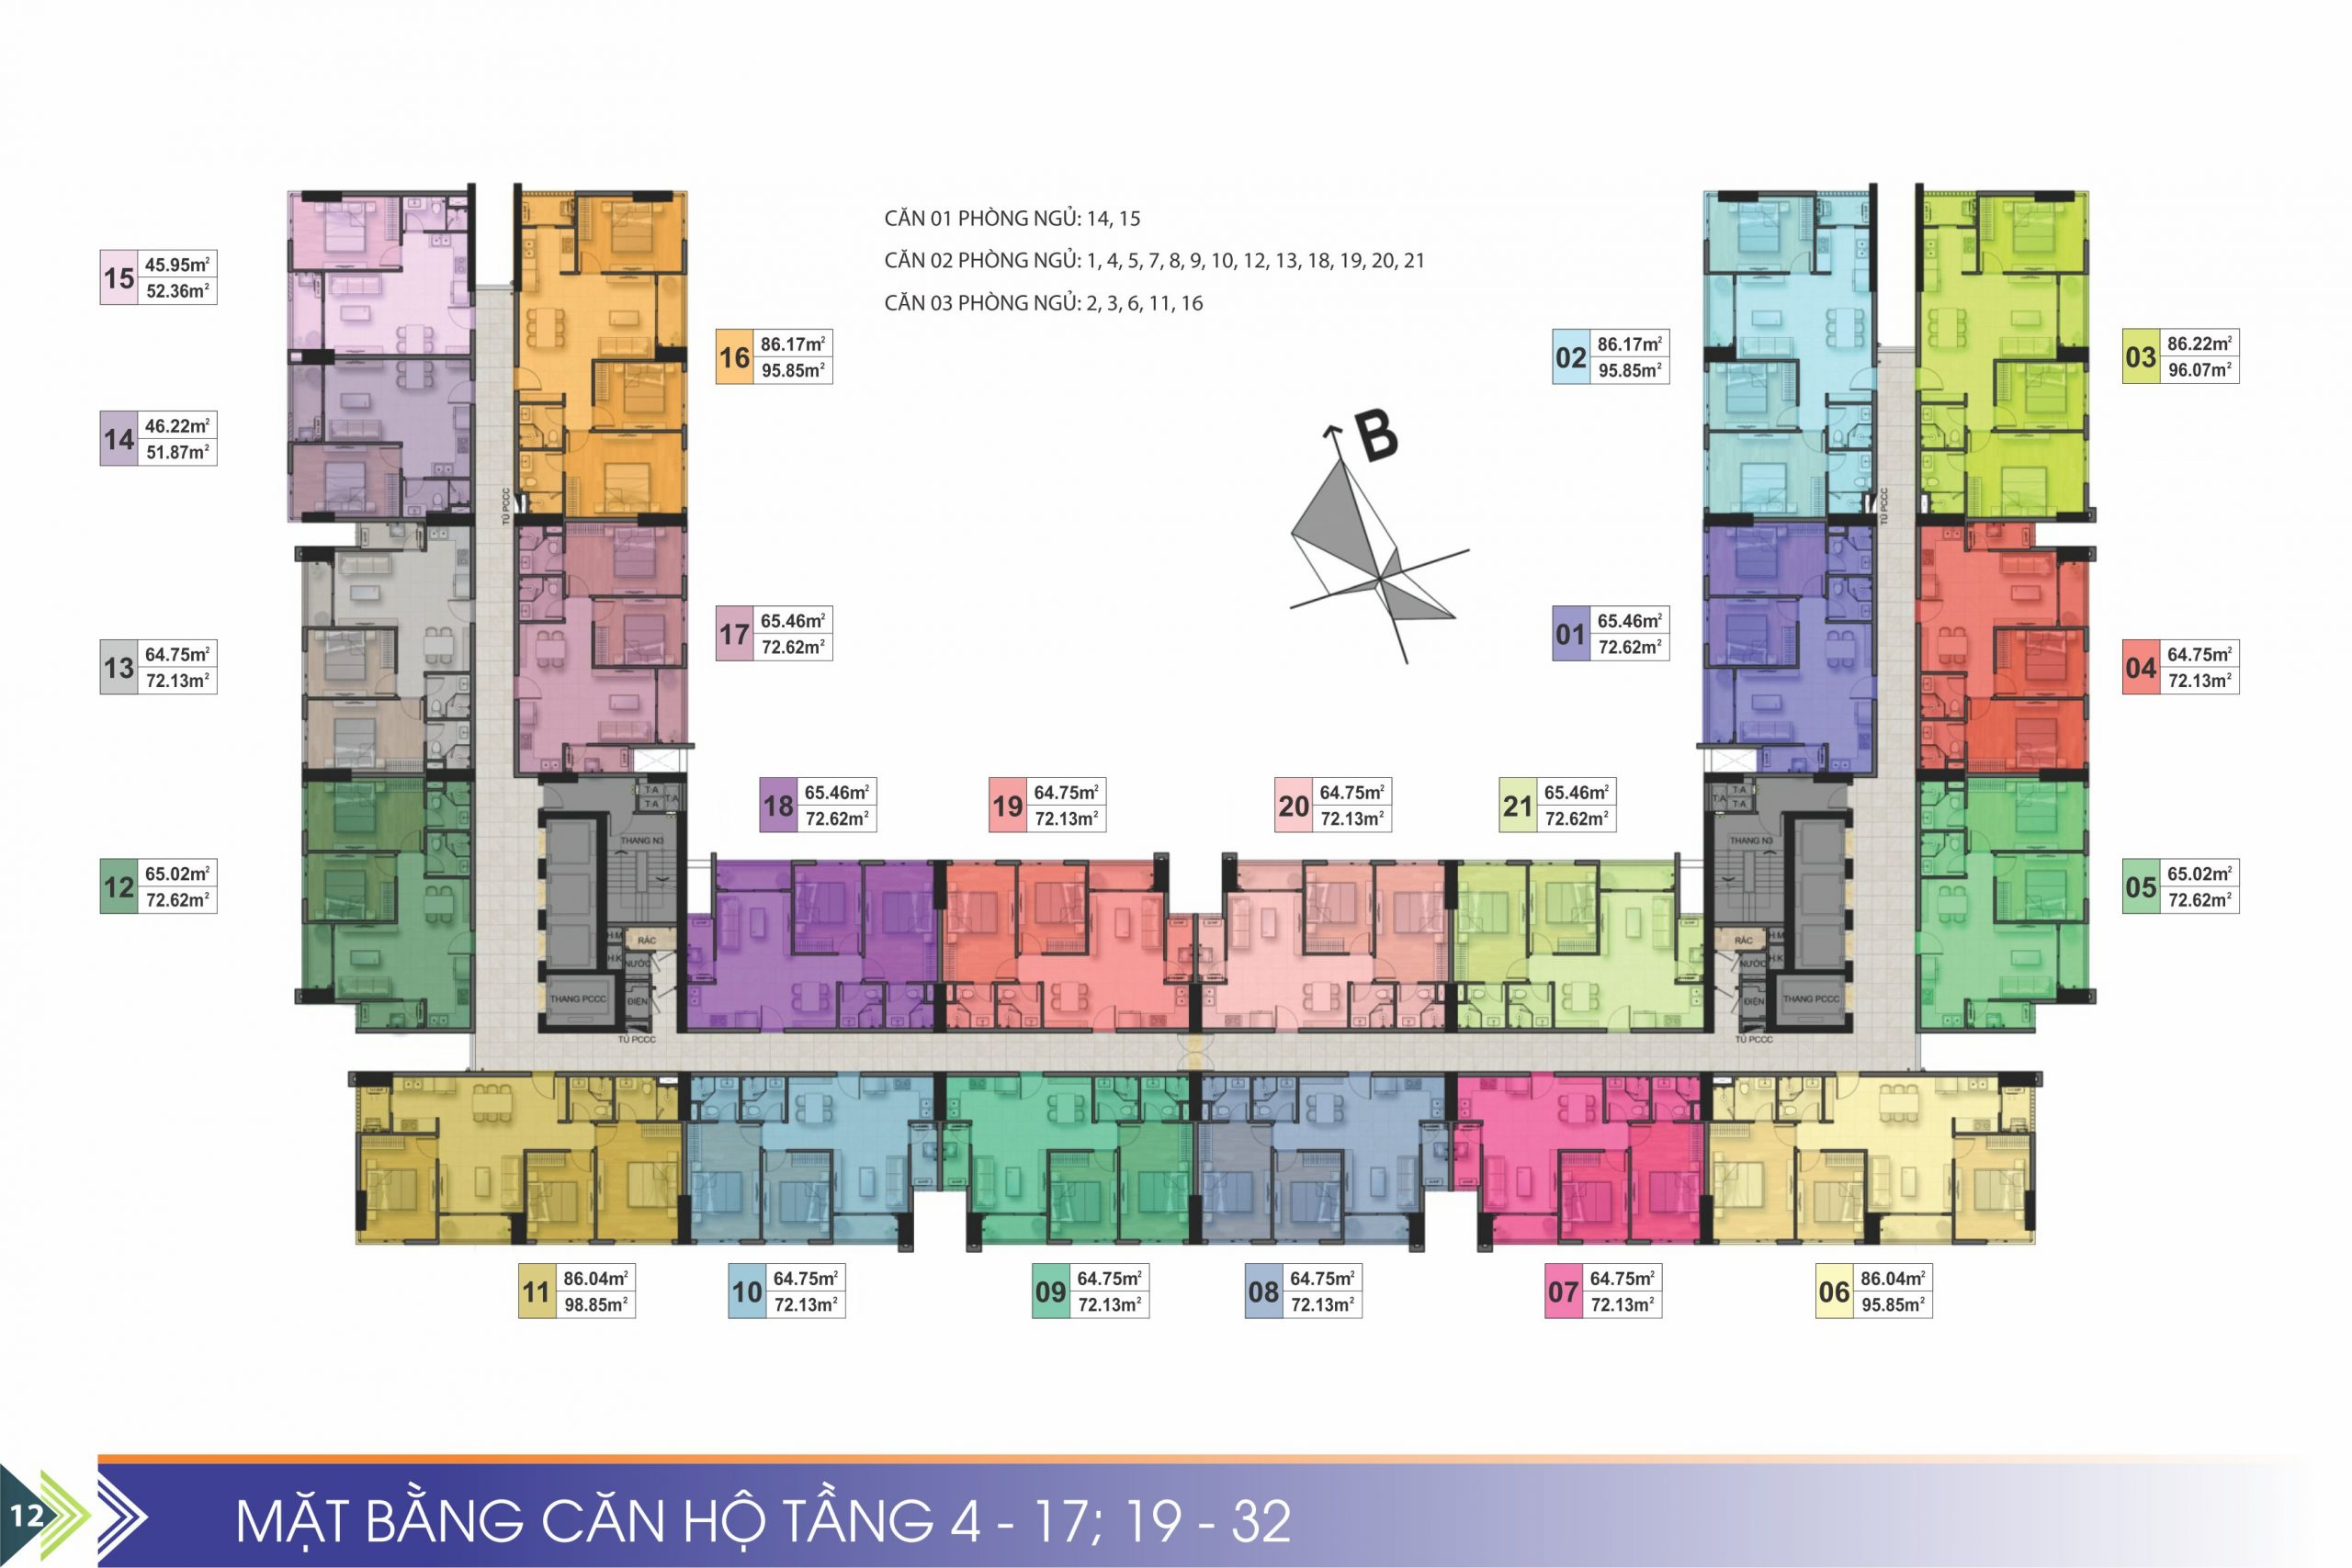 mb tang 4-17 phu tai residence